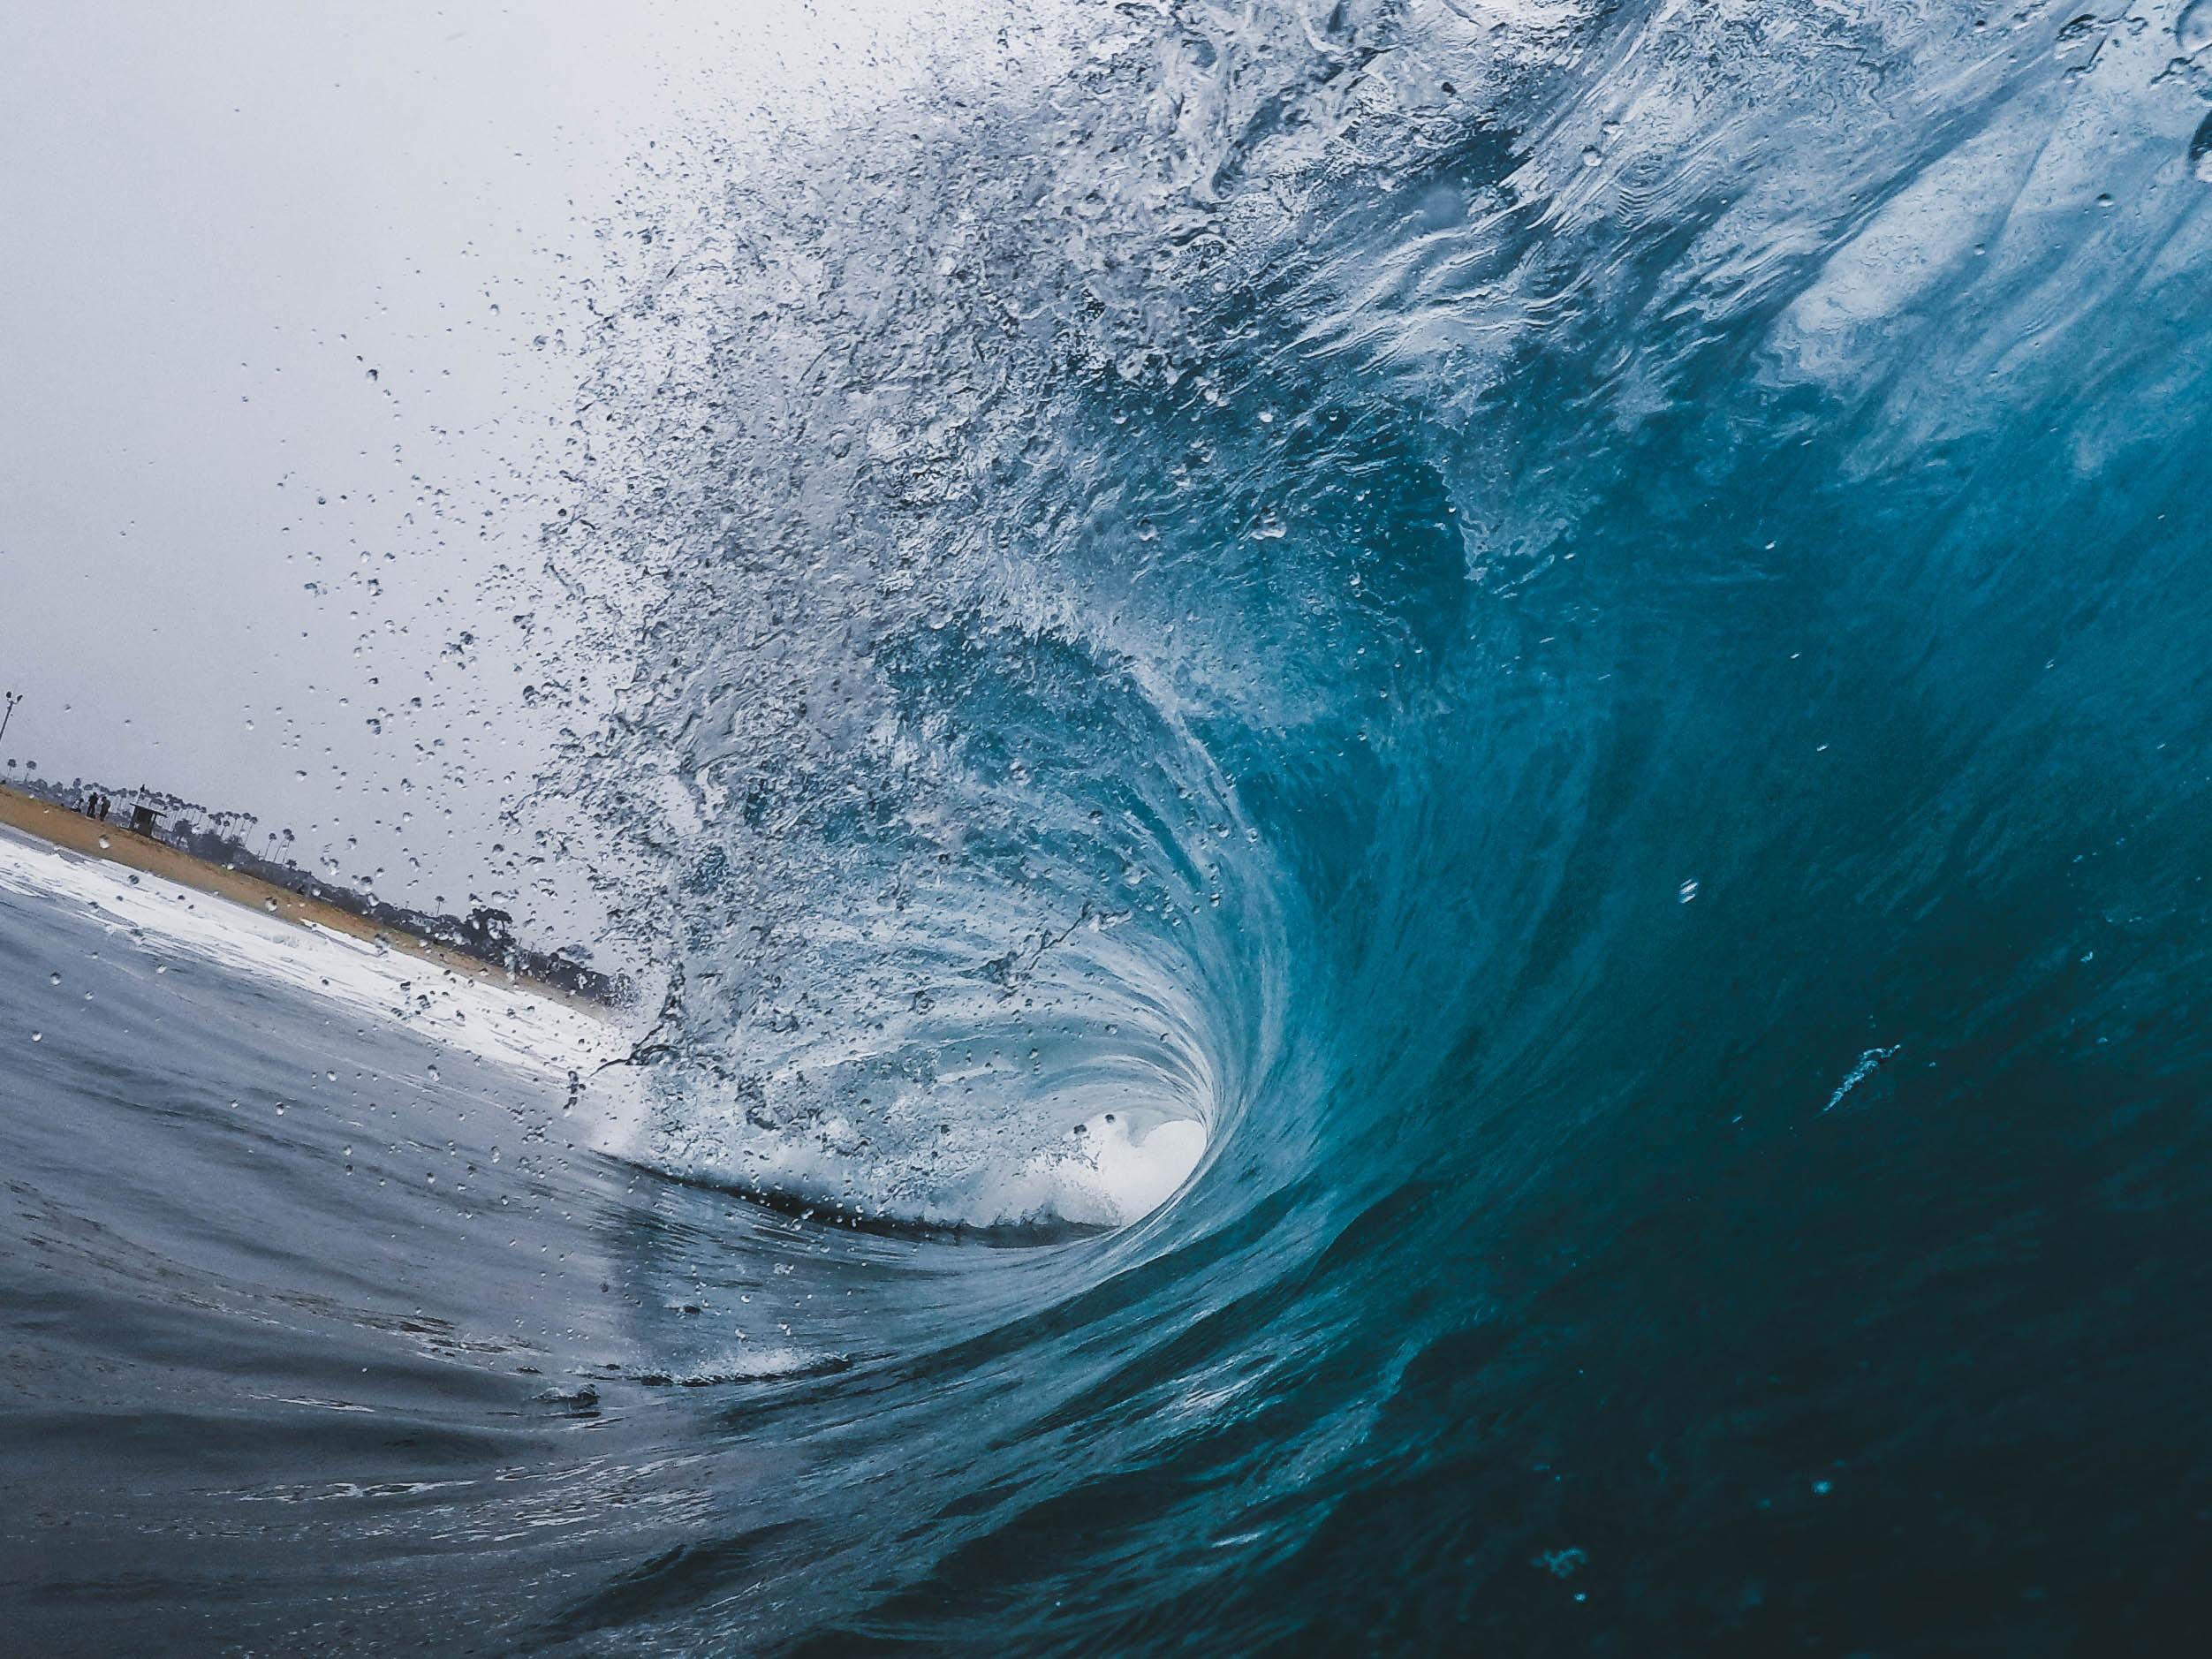 Spotting Gravitational Waves